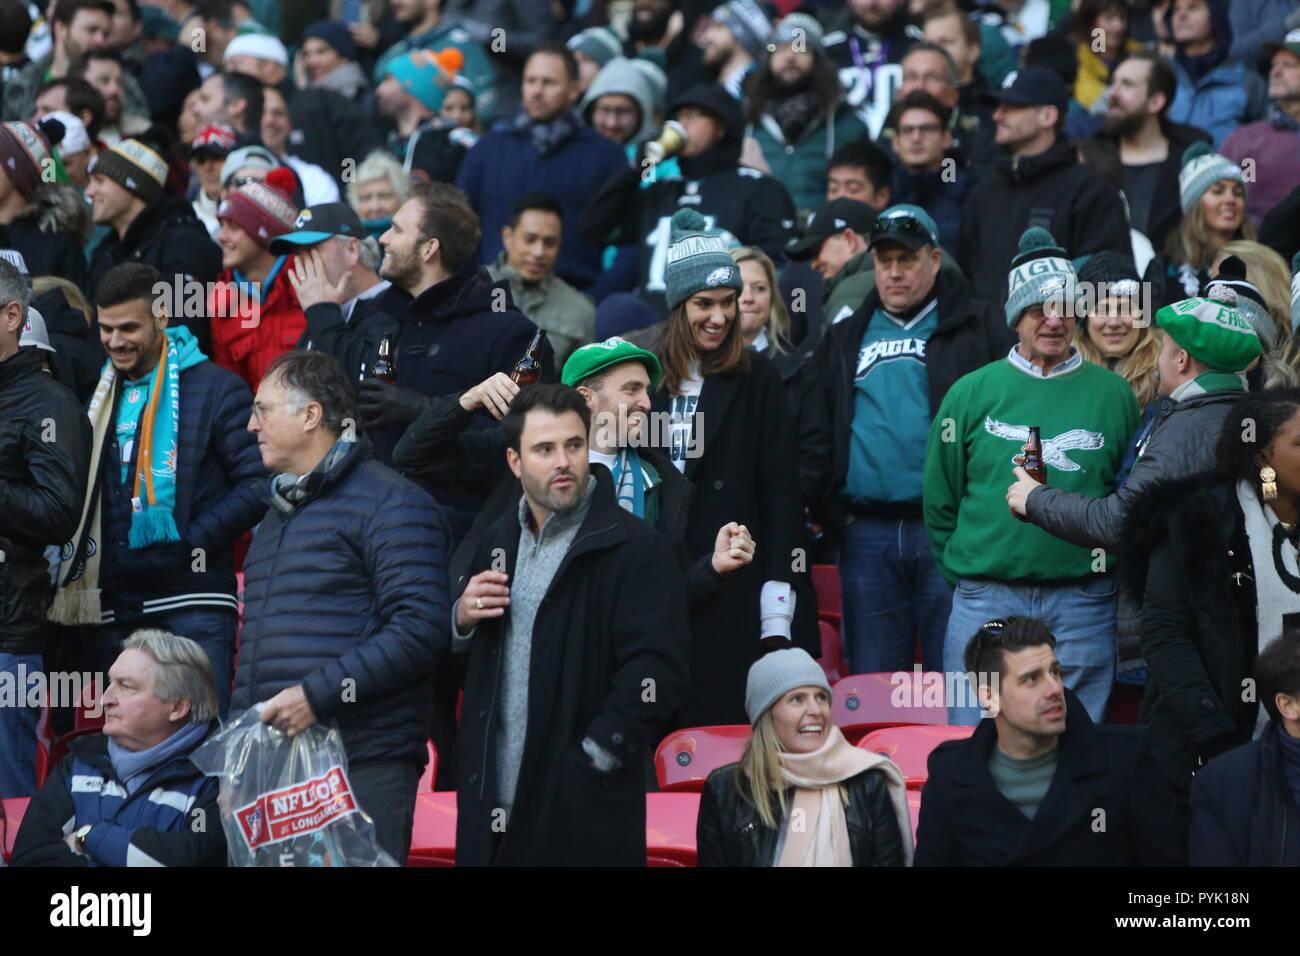 London, UK. 28 October 2018.  crowd celebrating win to Eagles  at the Eagles at Jaguars - credit Glamourstock Credit: glamourstock/Alamy Live News - Stock Image